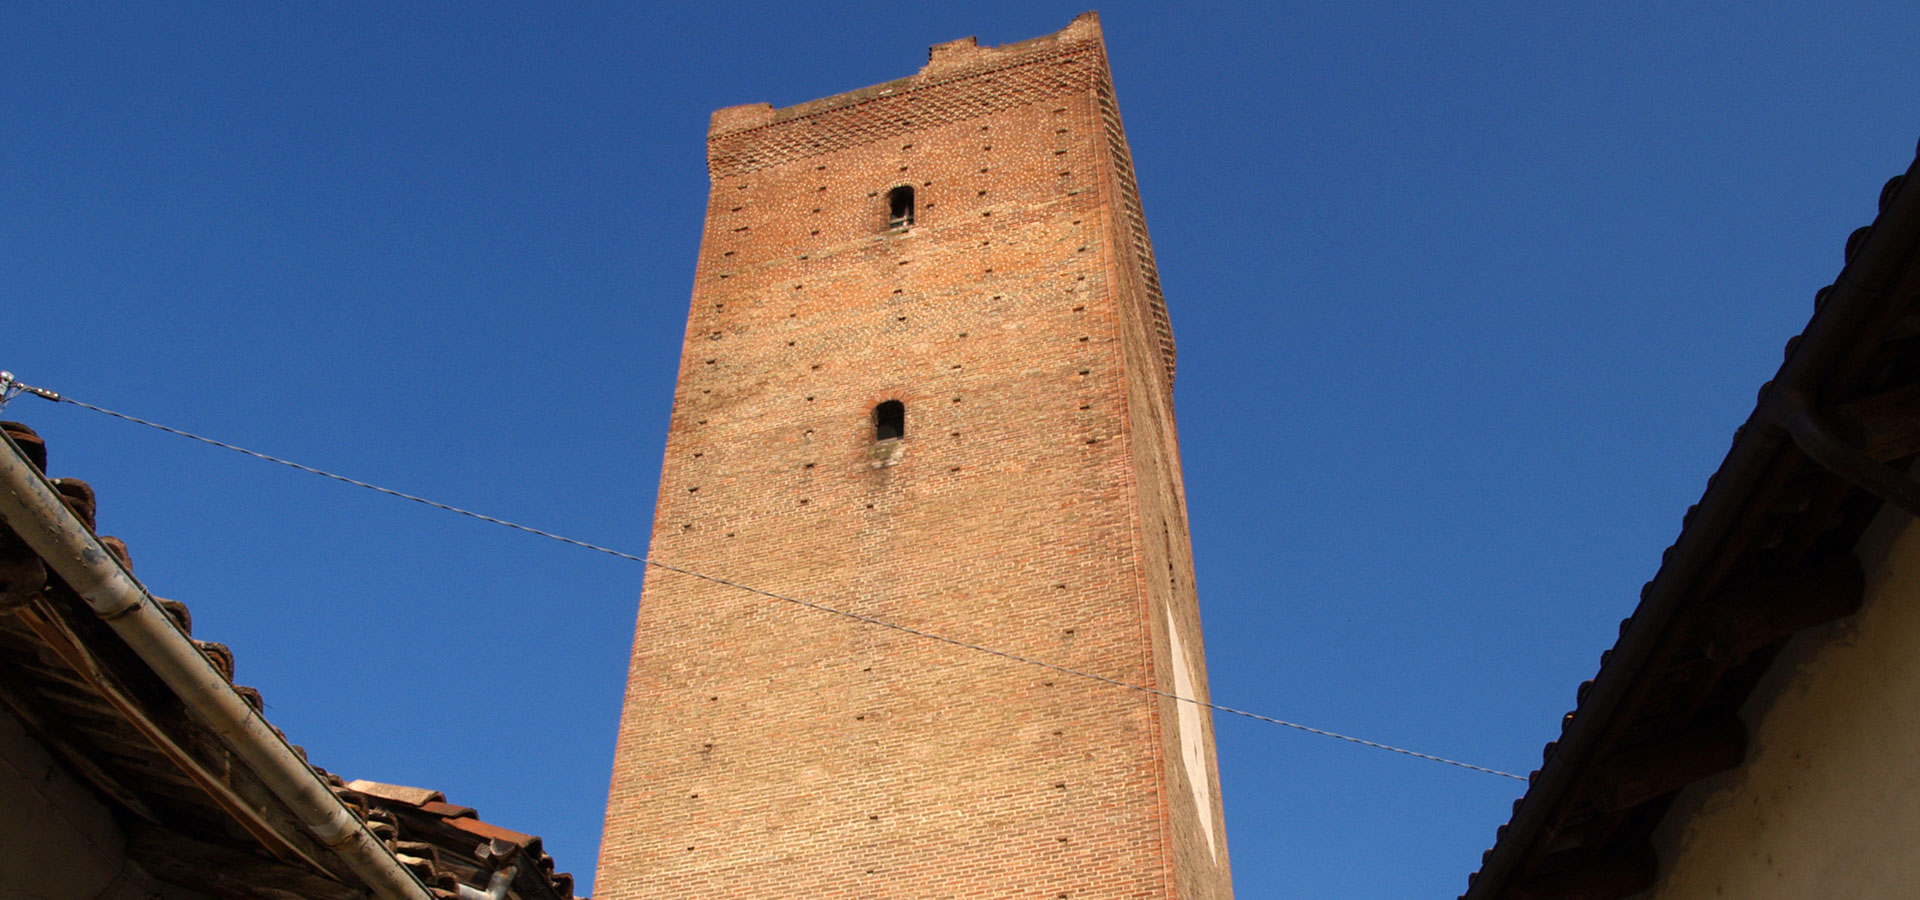 Torre-di-barbaresco-1